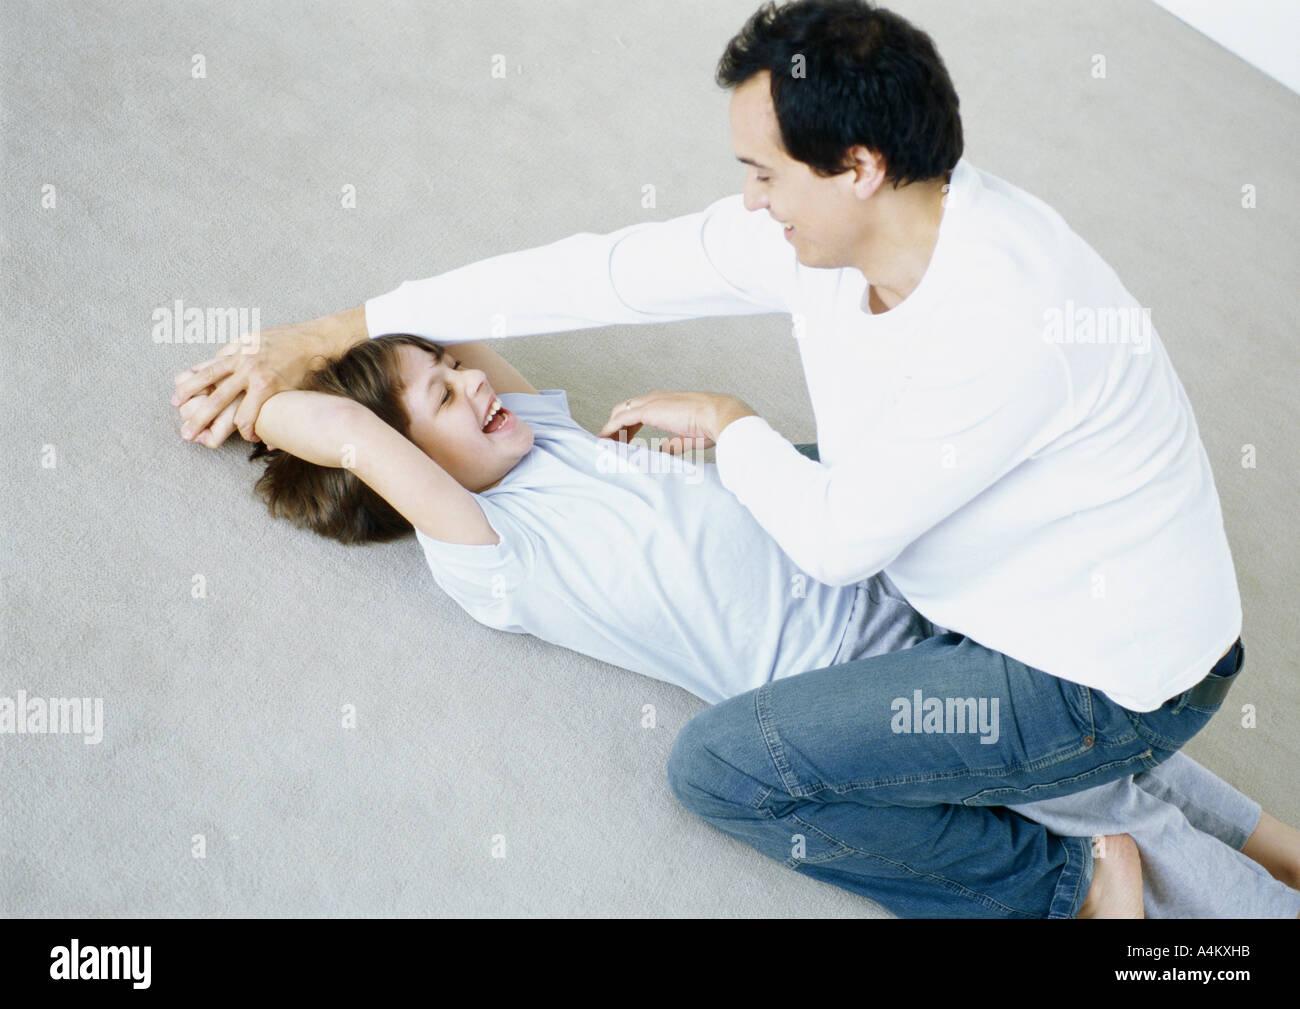 Kitzeln junge Mann am Boden Stockfoto, Bild: 6328986 - Alamy